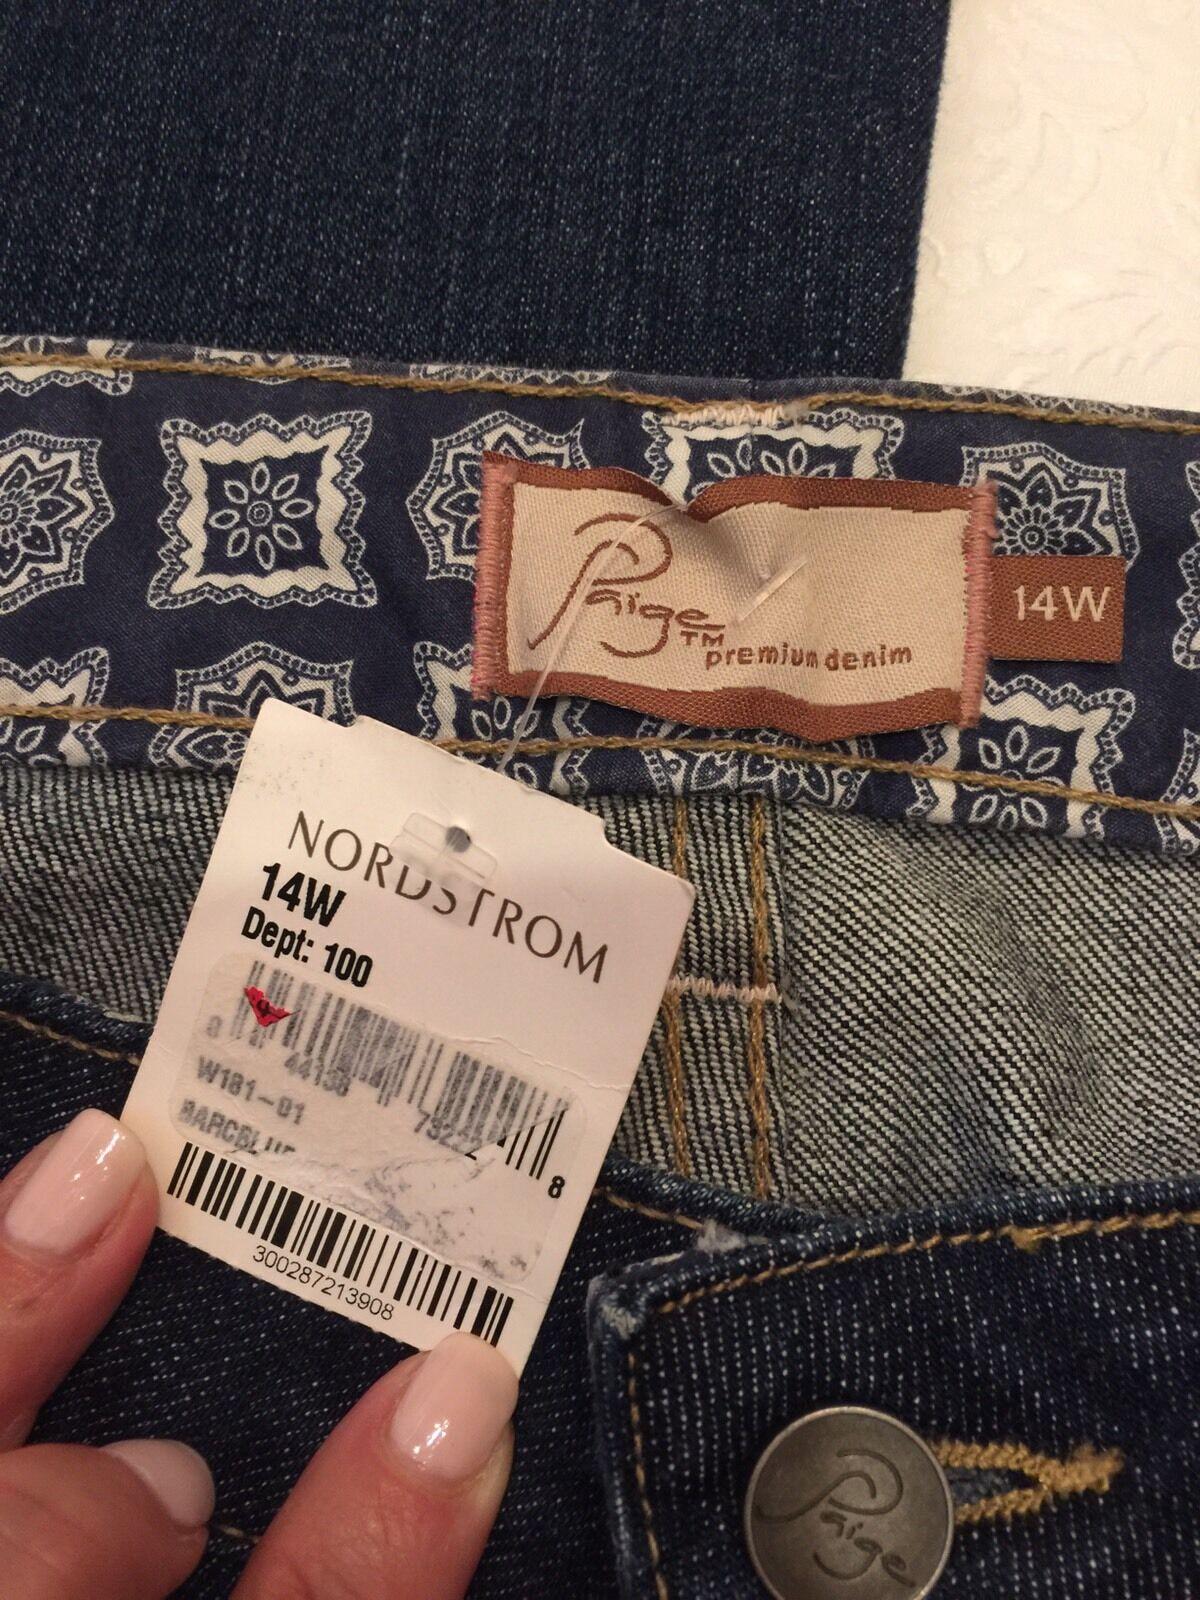 Paige bluee Jeans Tags Nordstroms 14W